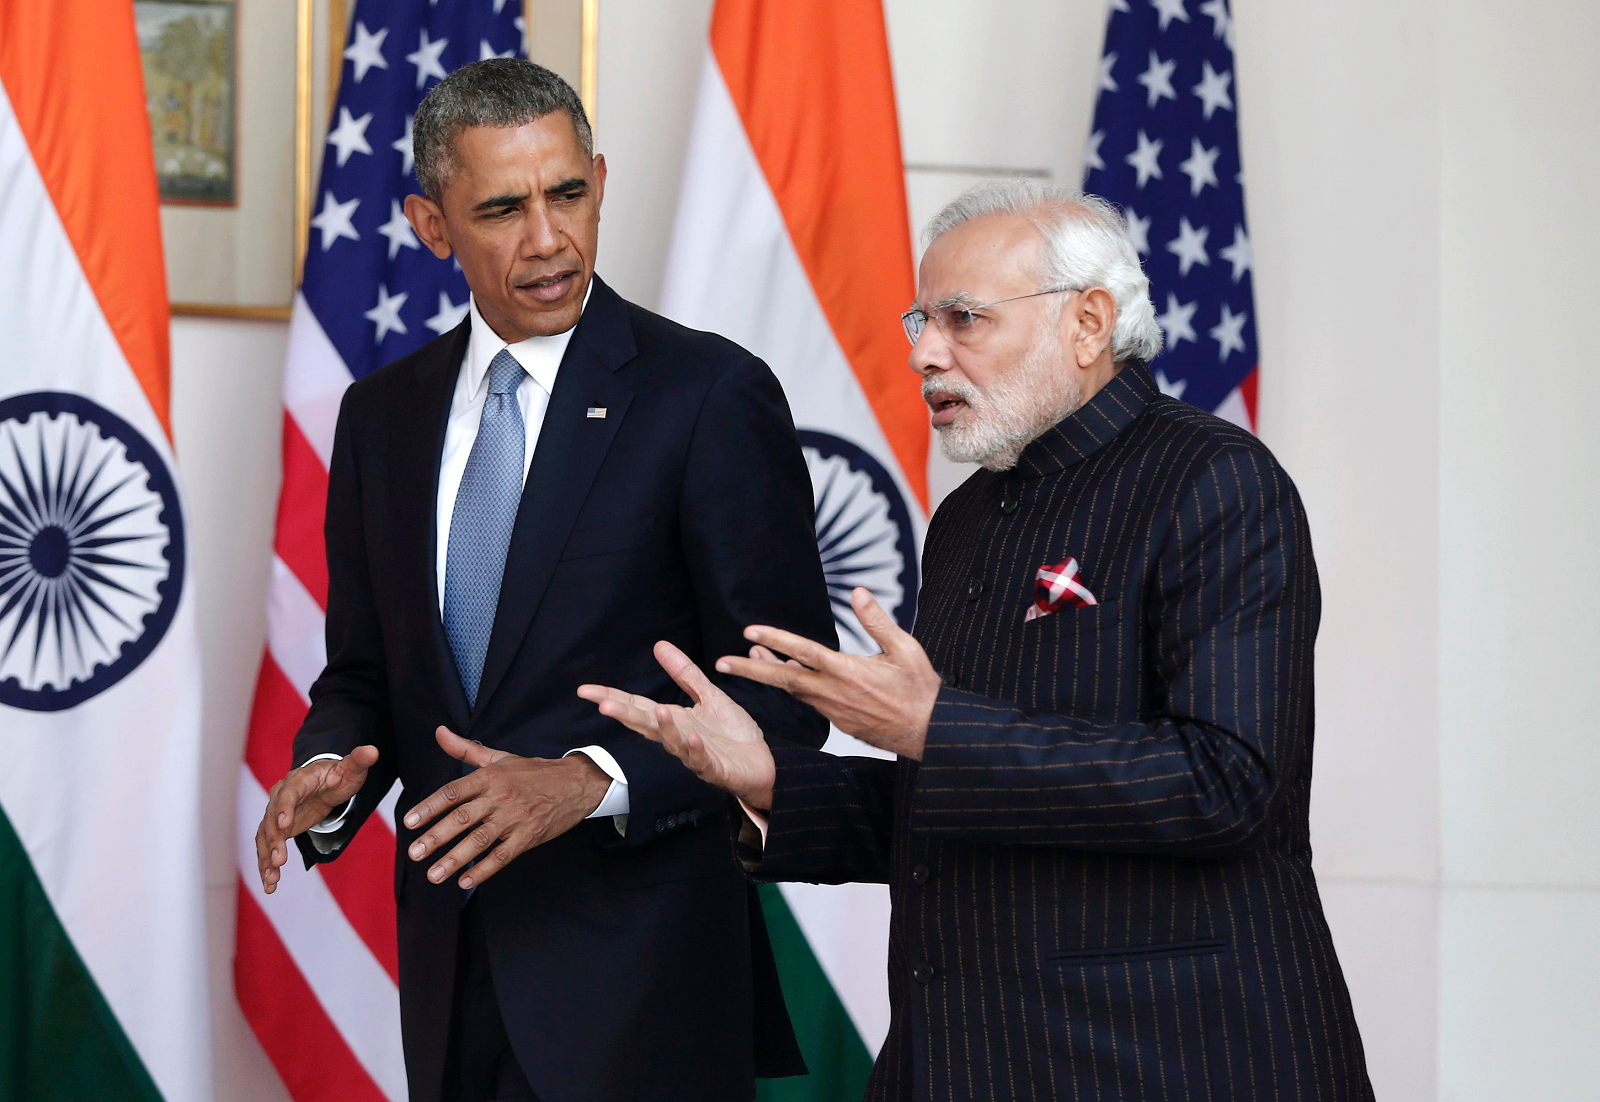 Us, United States, China, Russia, Indo-China